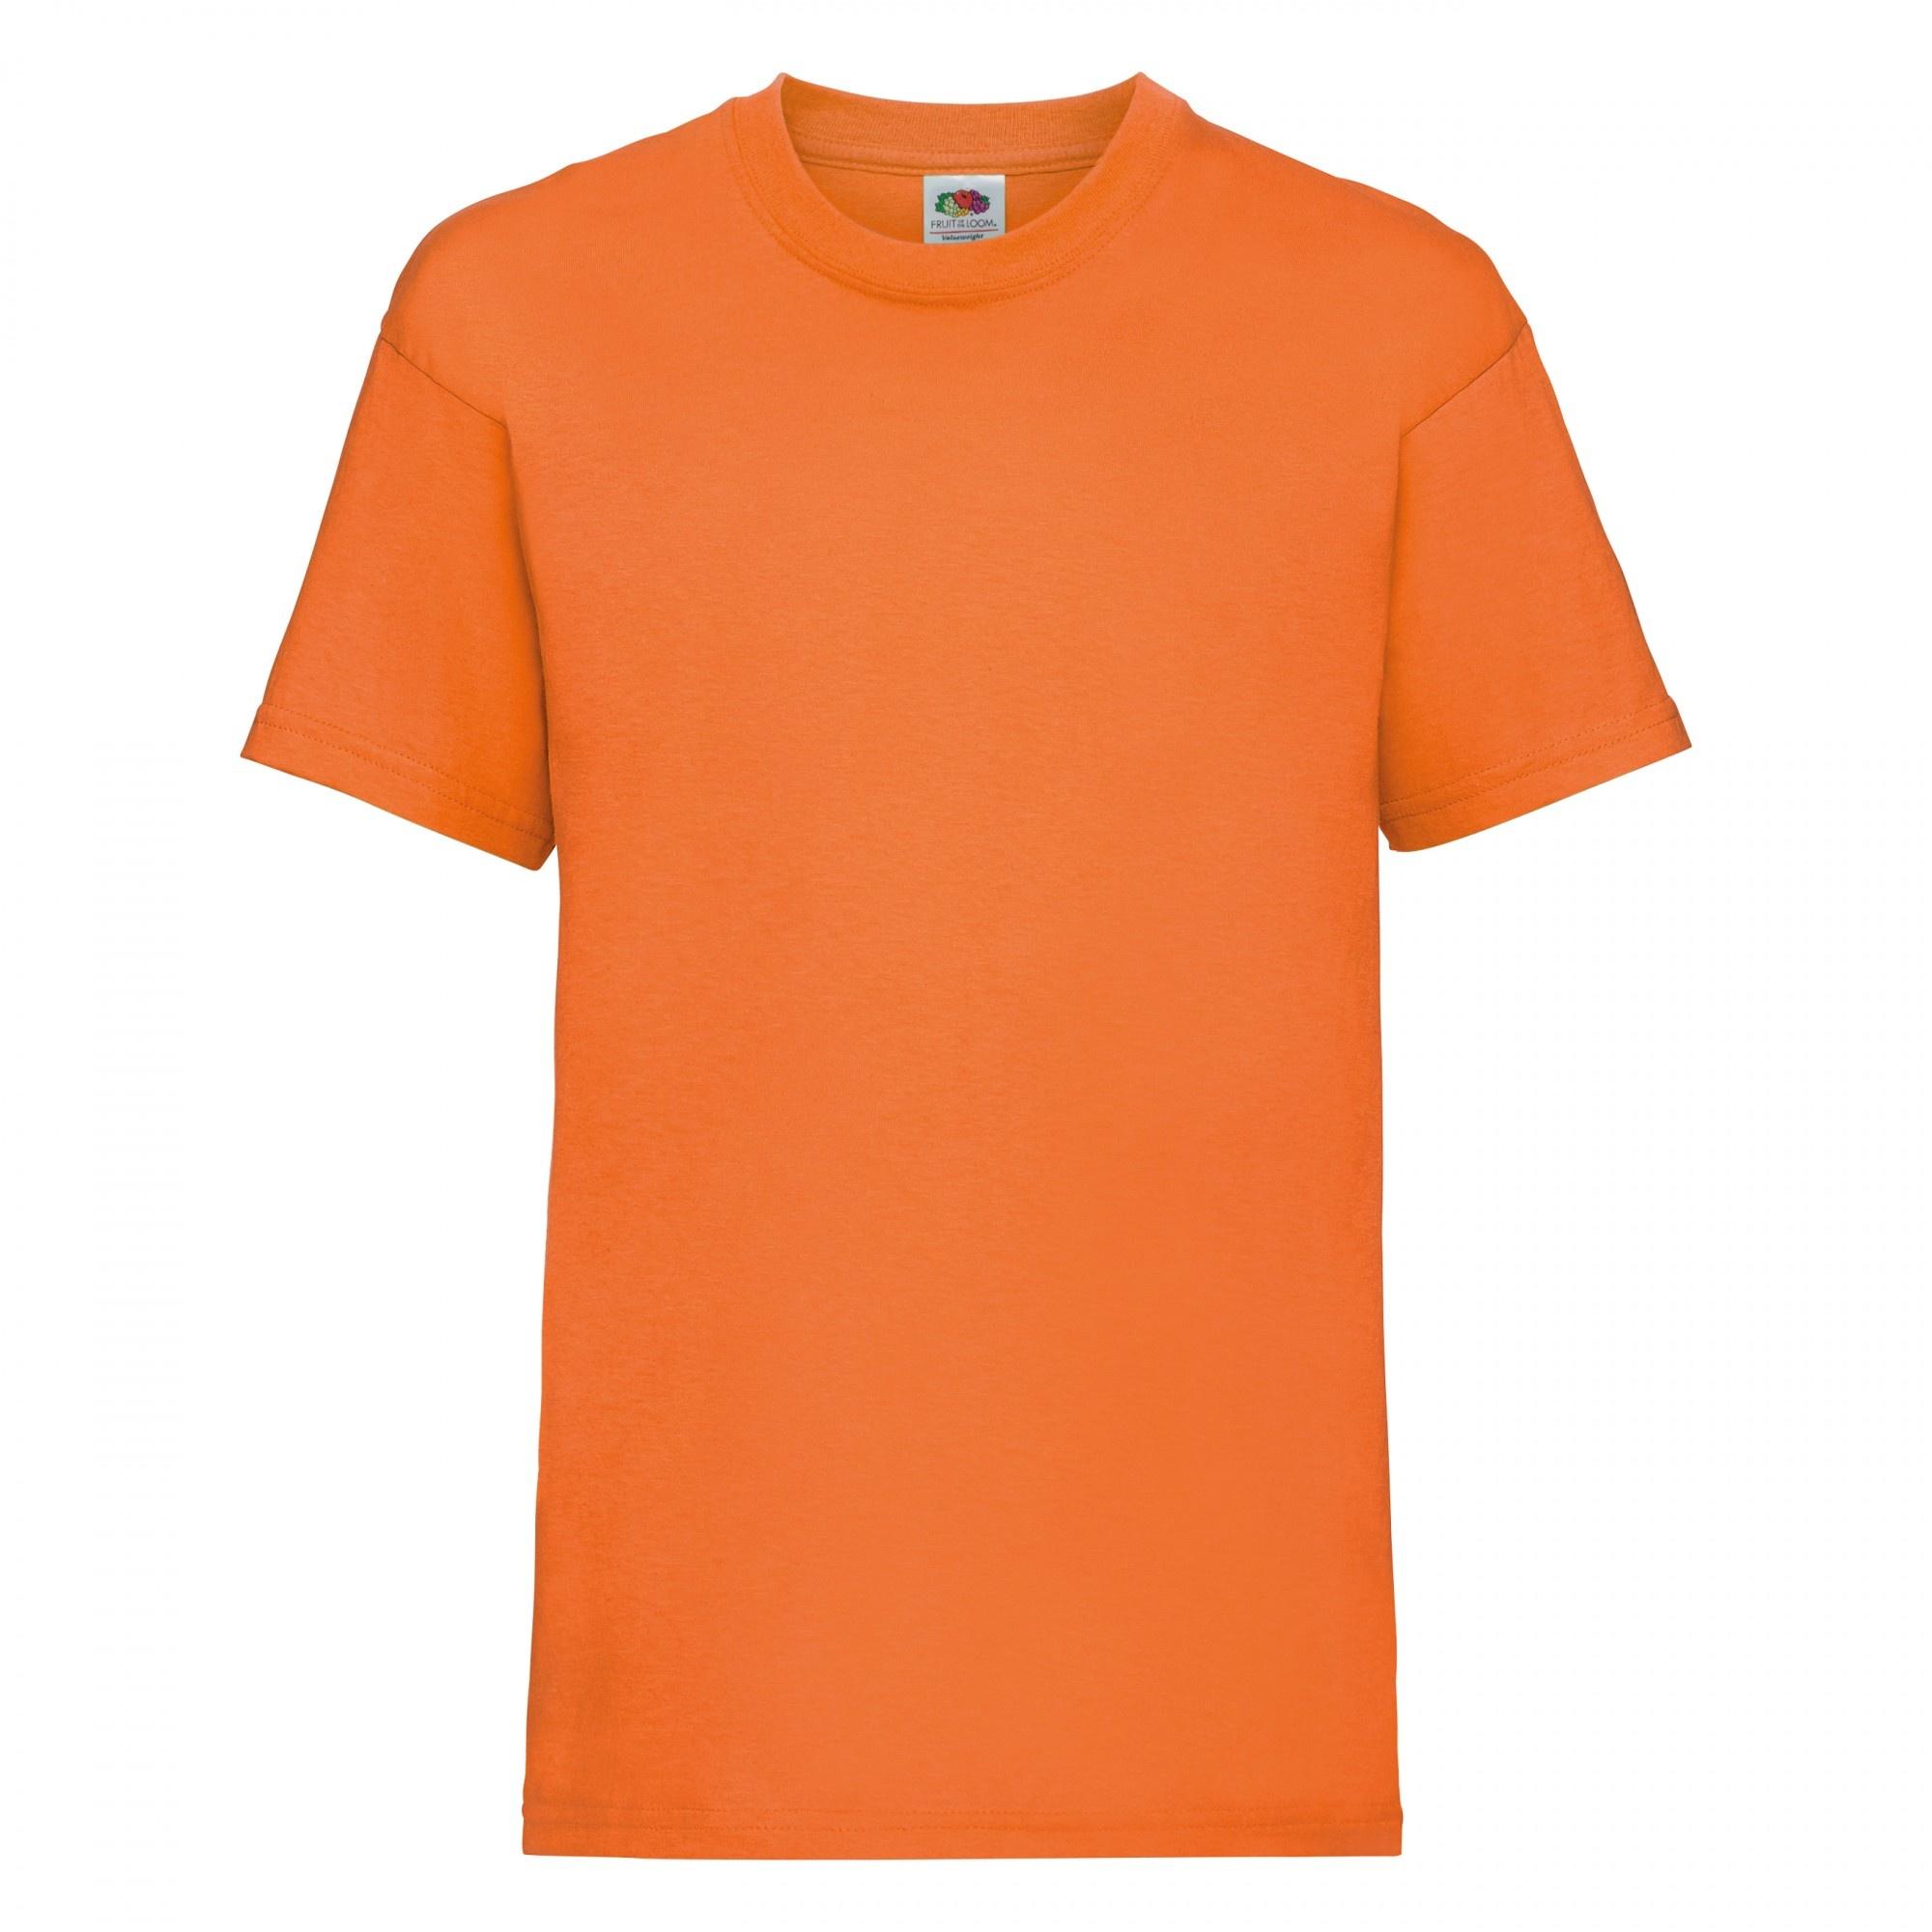 Fruit Of The Loom Childrens/Kids Unisex Valueweight Short Sleeve T-Shirt (7-8) (Orange)